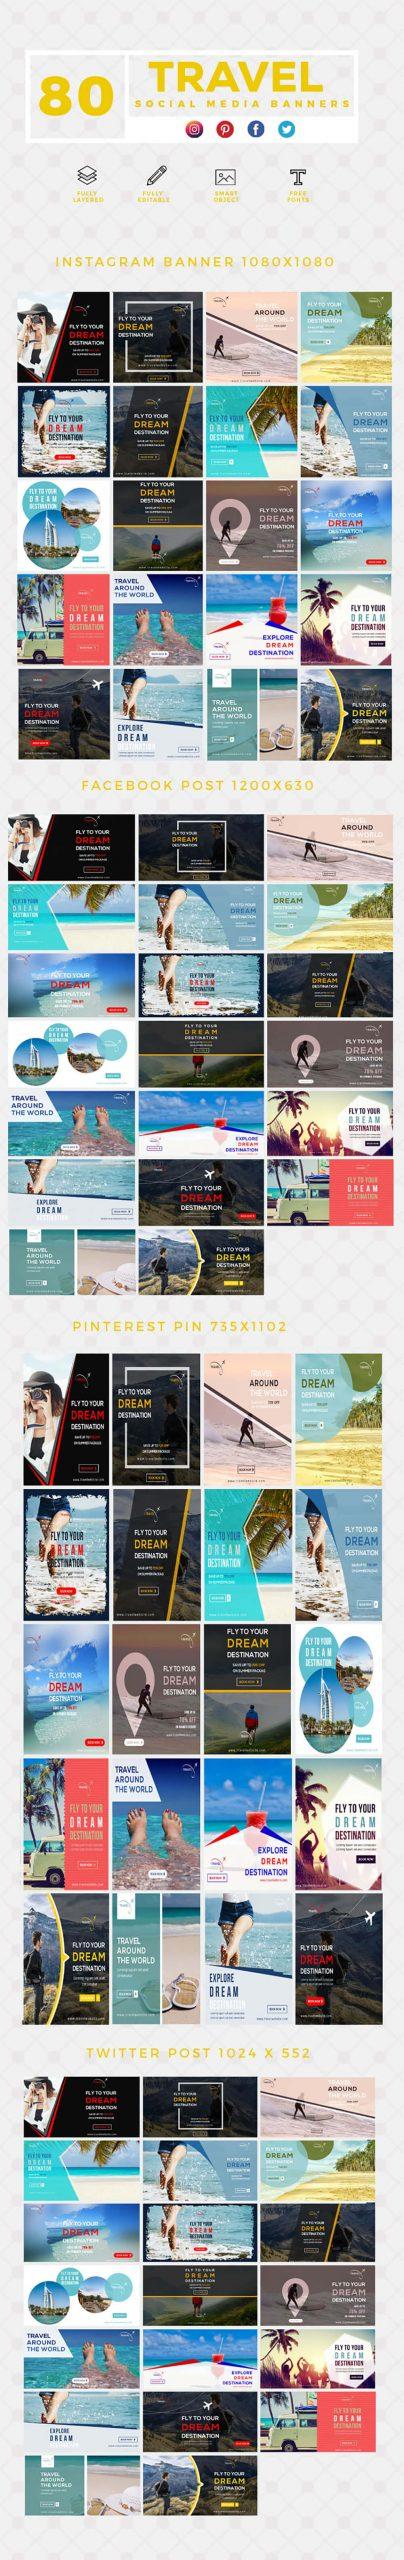 640 Social Media Banner Templates Bundle PREVIEW-TRAVEL